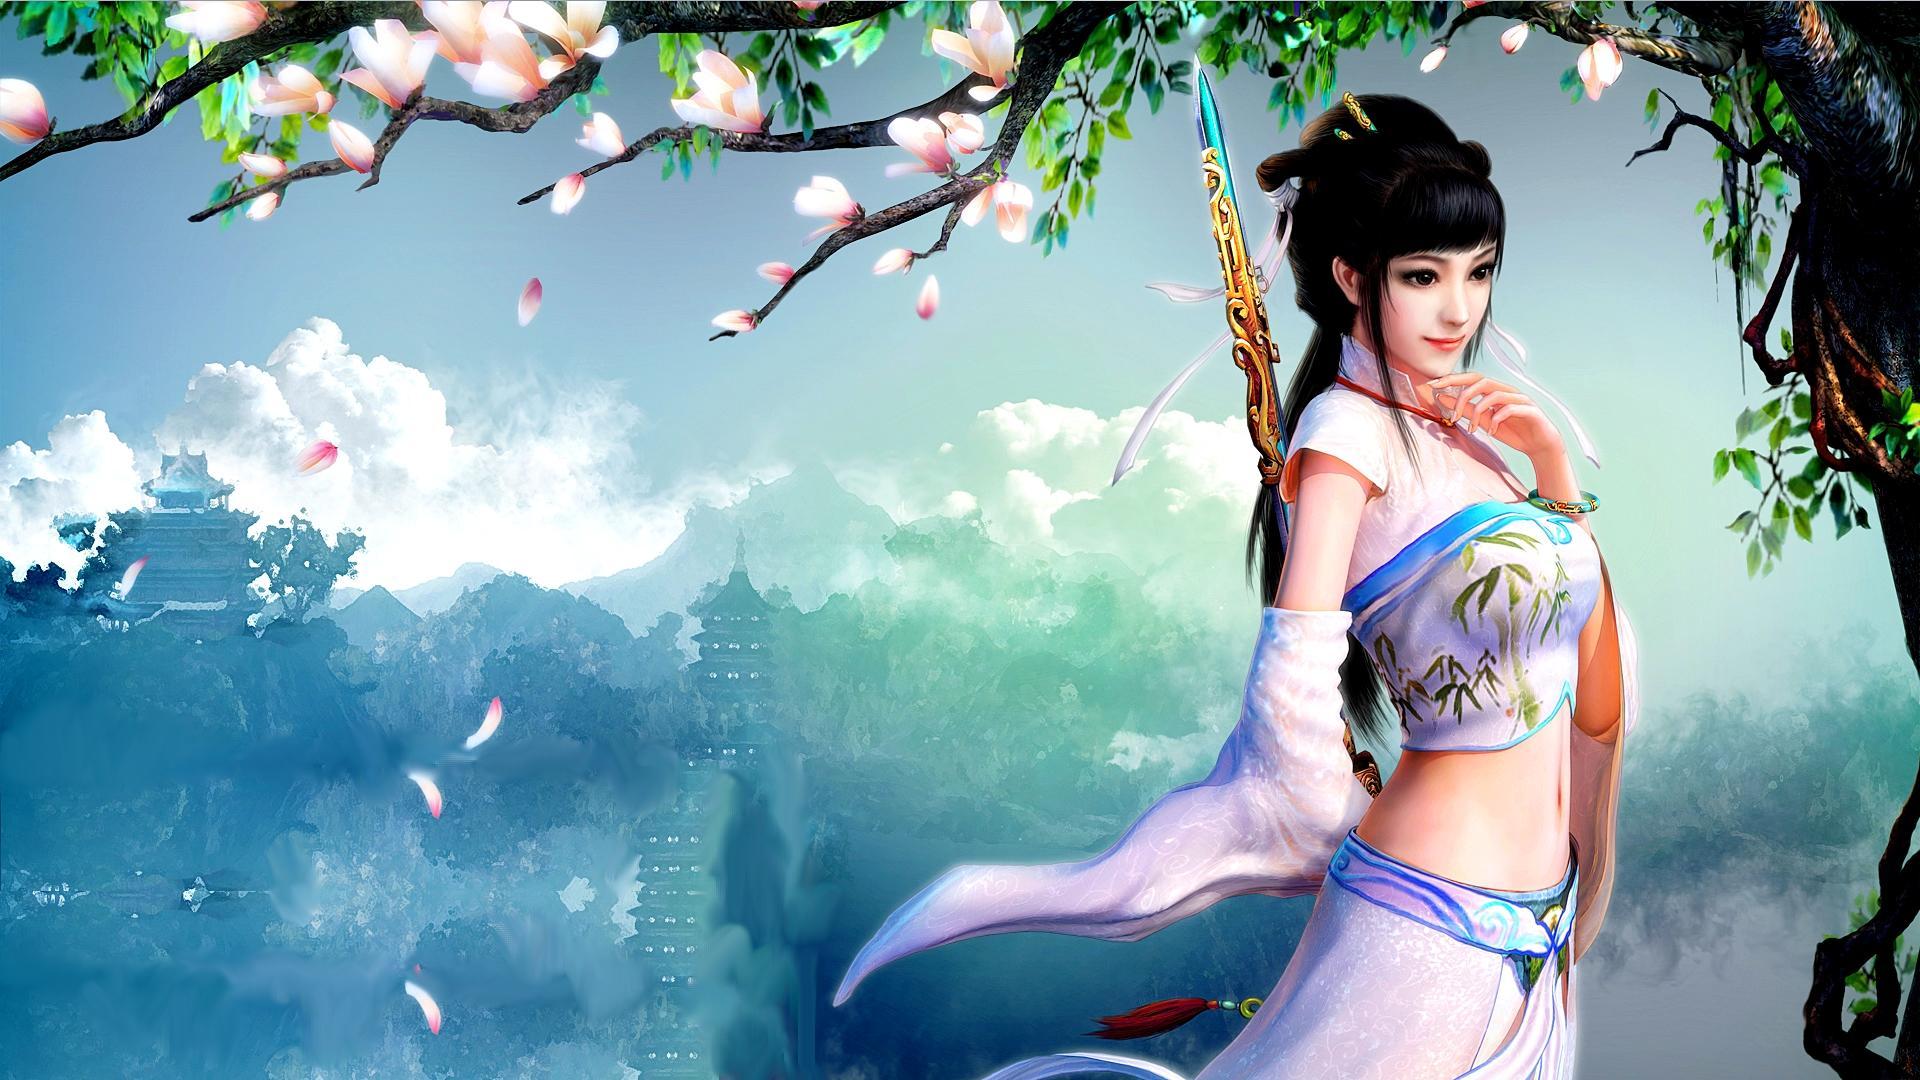 fantasy girl hd wallpaper | background image | 1920x1080 | id:706706